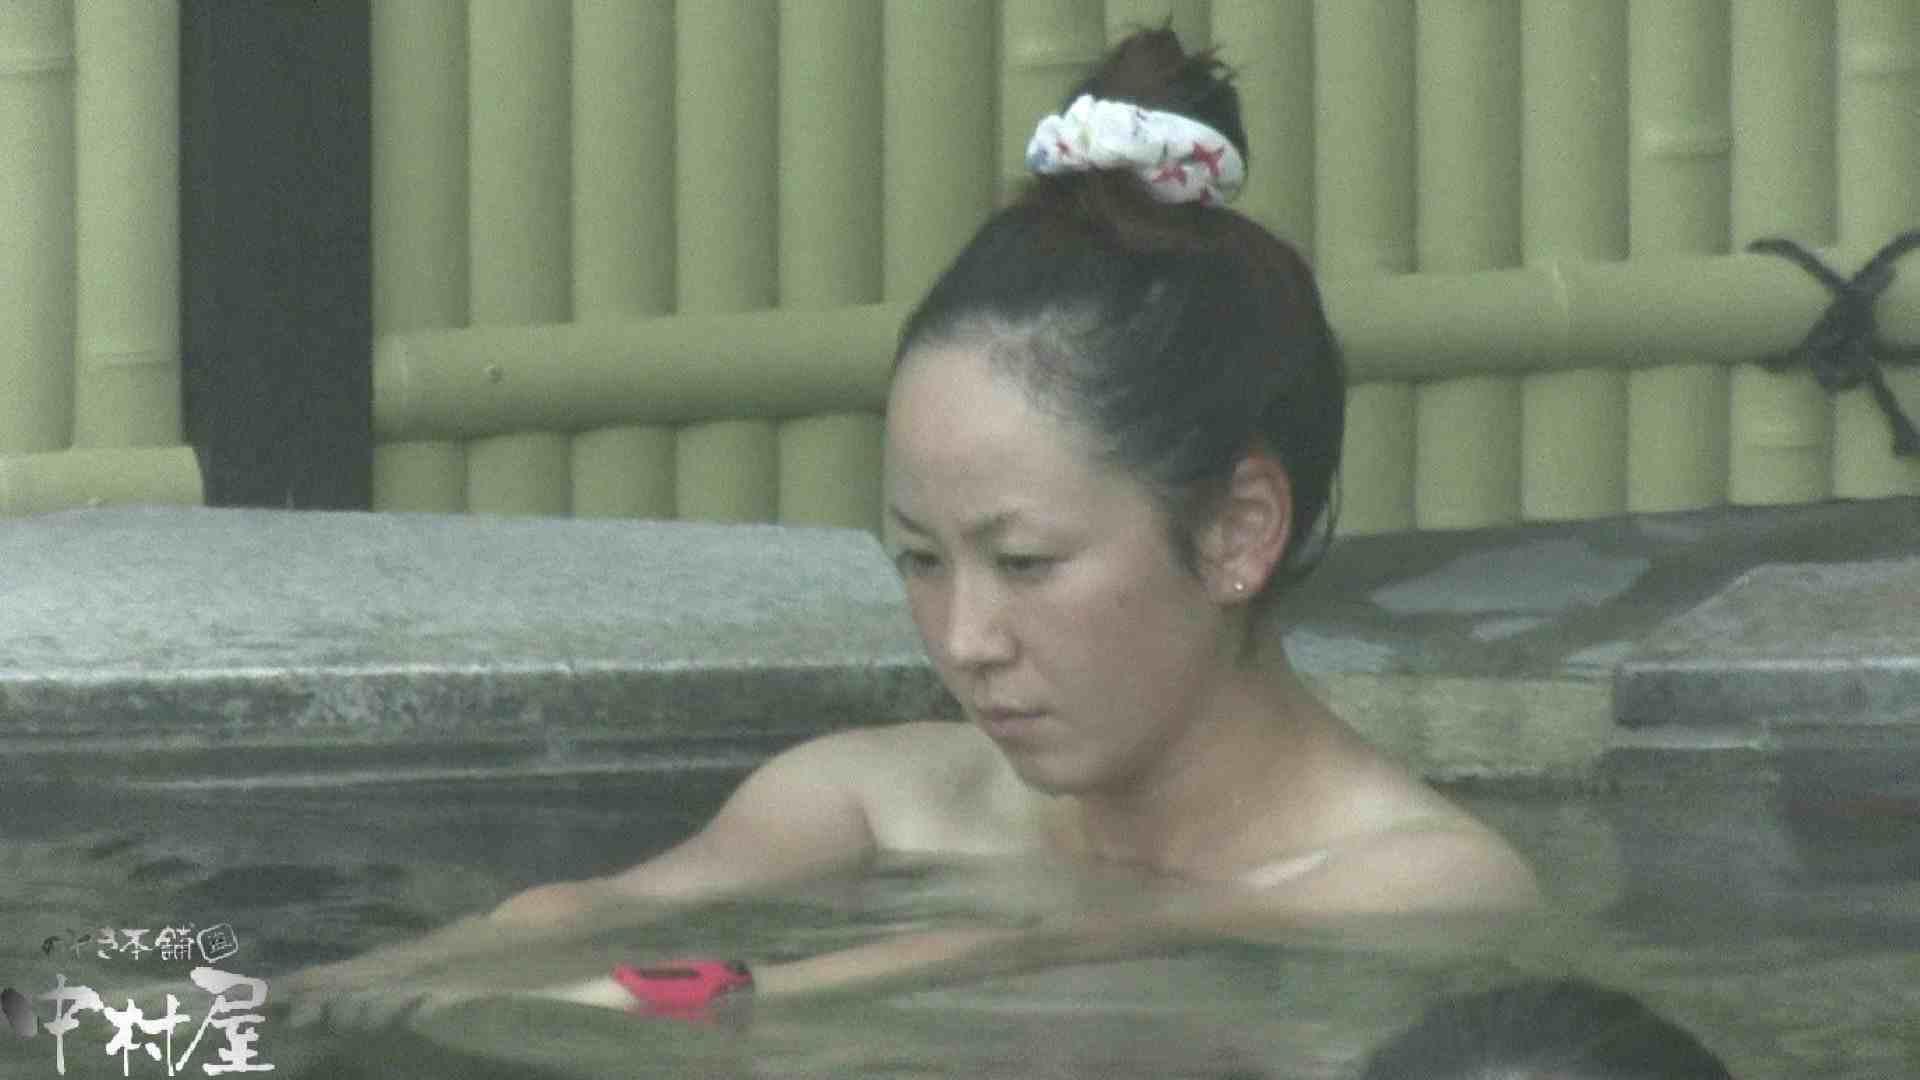 Aquaな露天風呂Vol.911 0   0  88連発 75